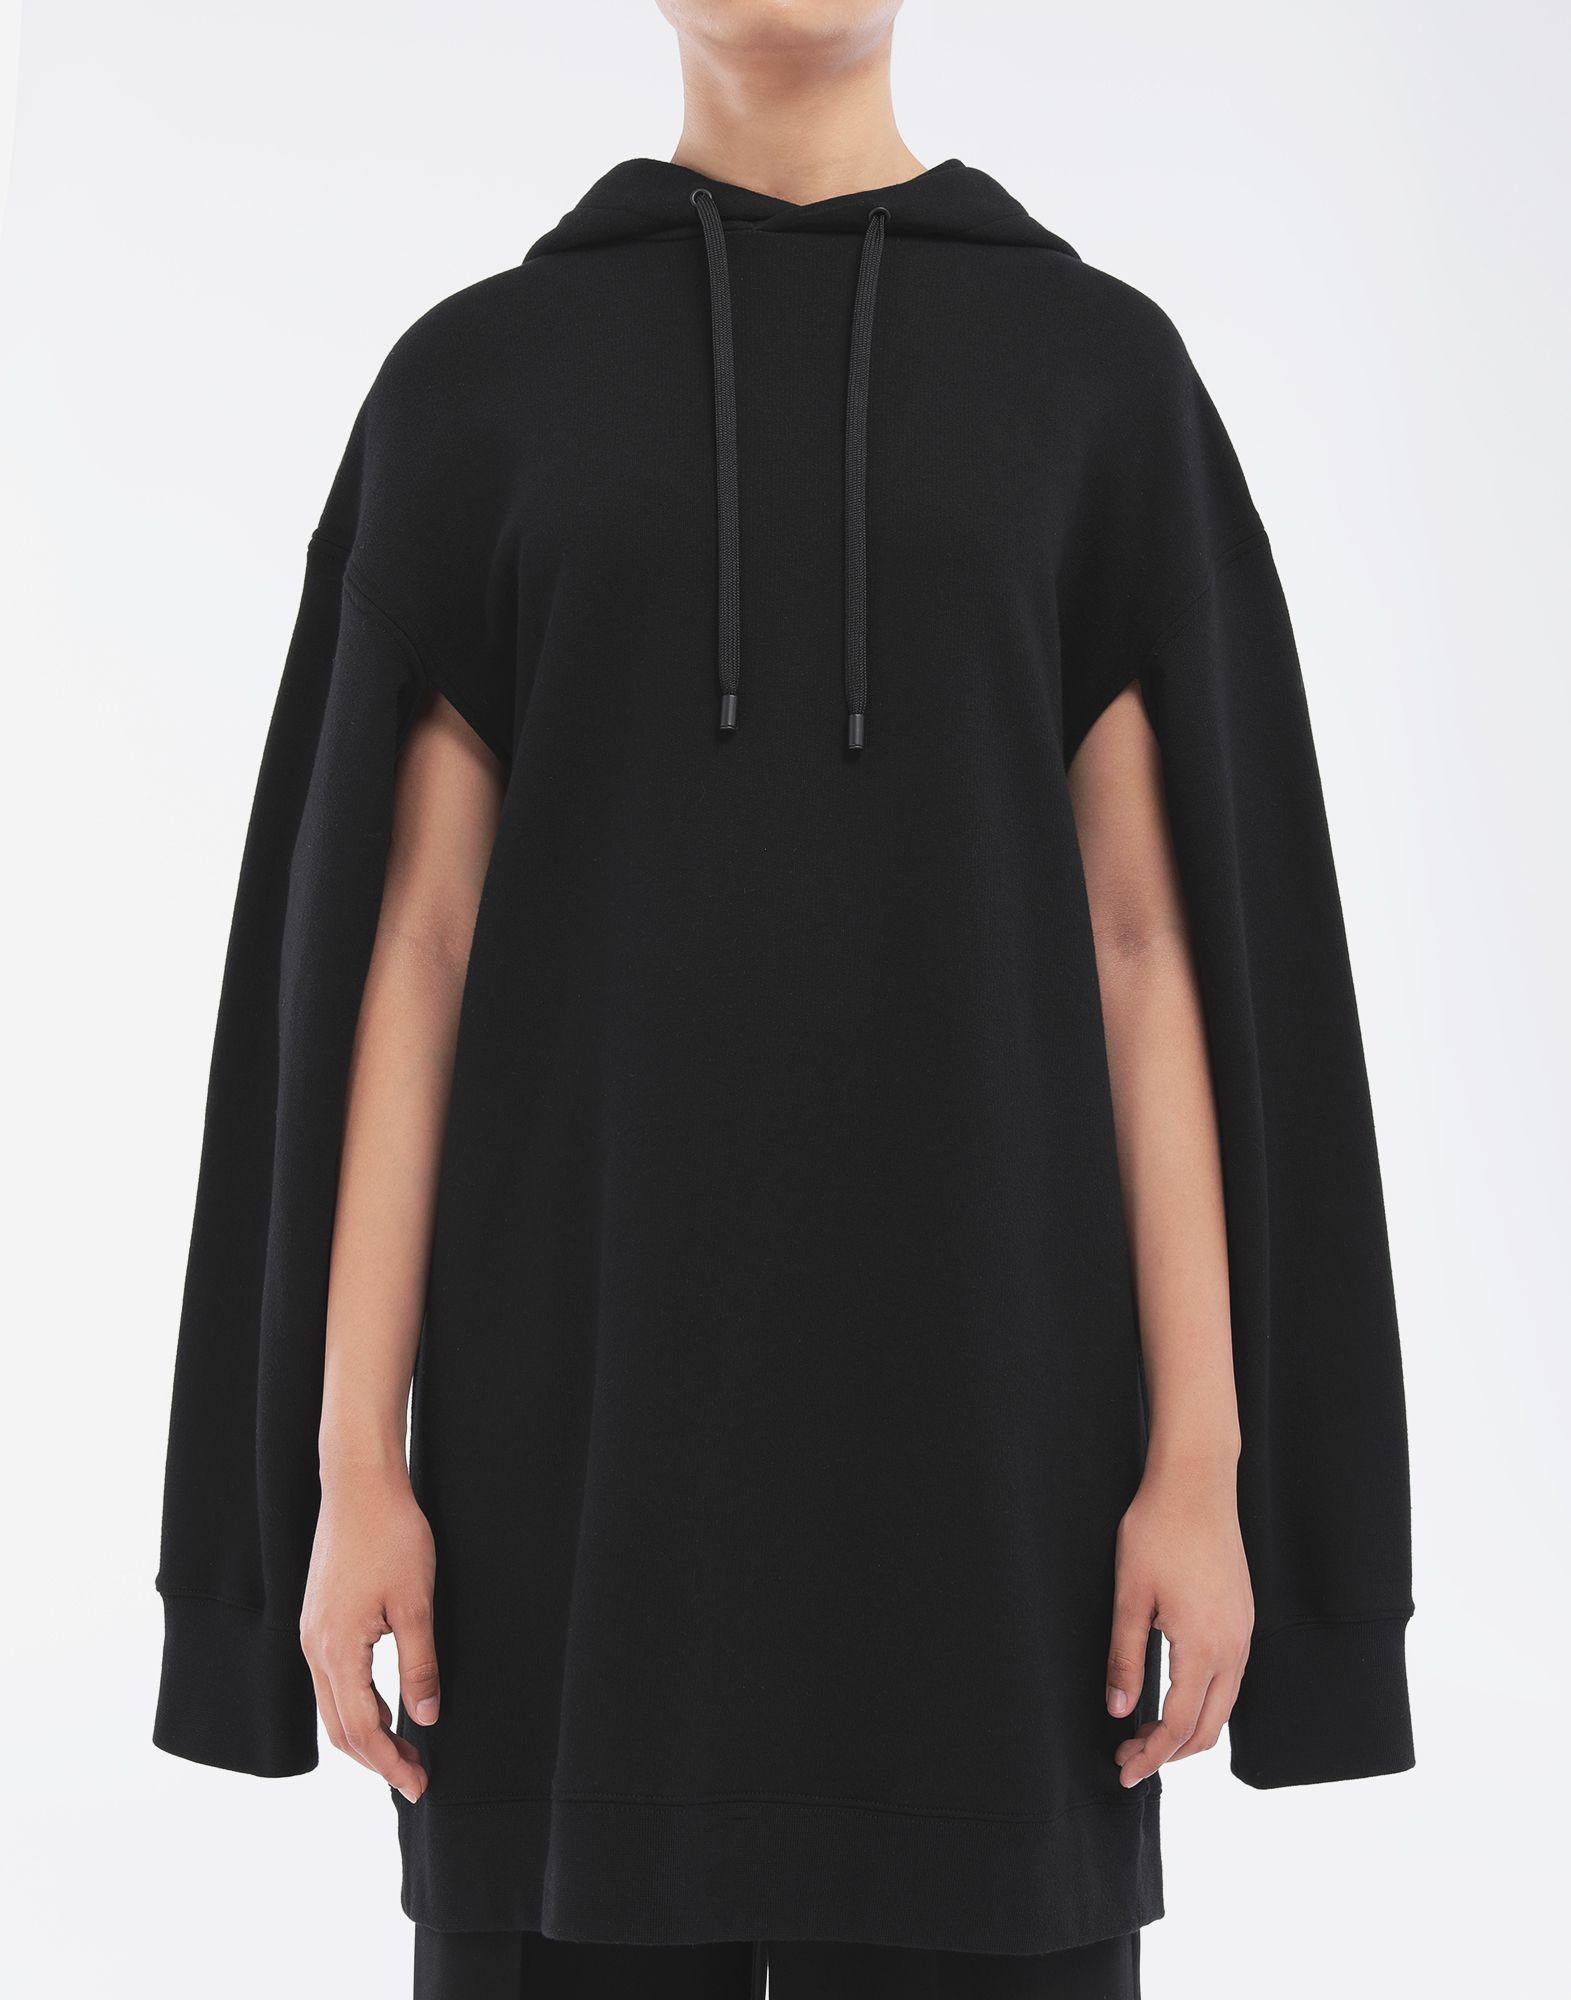 MAISON MARGIELA Long-line hooded sweatshirt Hooded sweatshirt Woman a